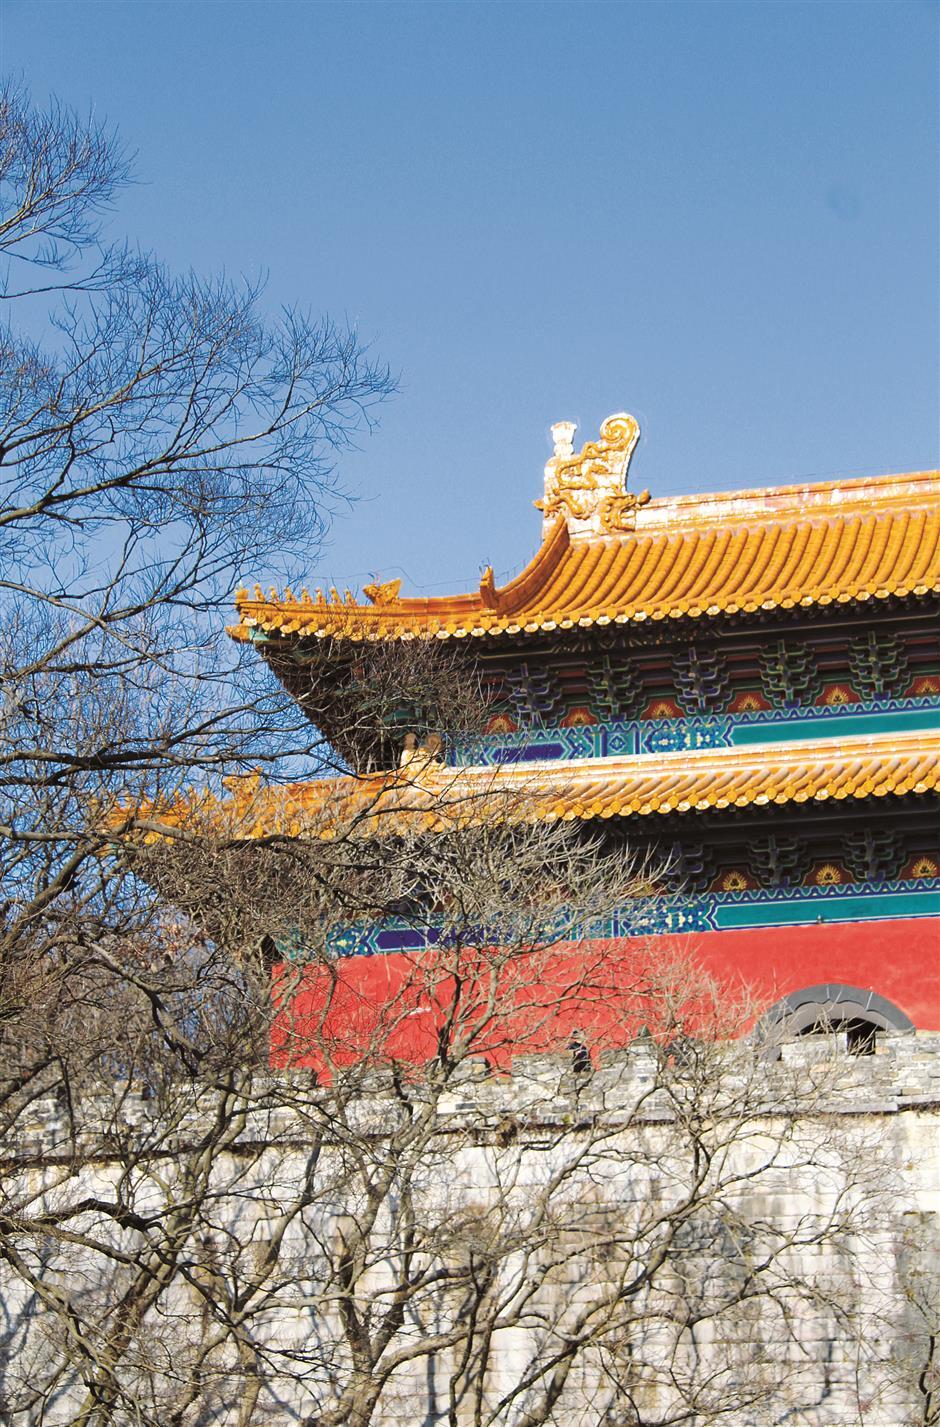 Immortalizing those who shaped Chinese history